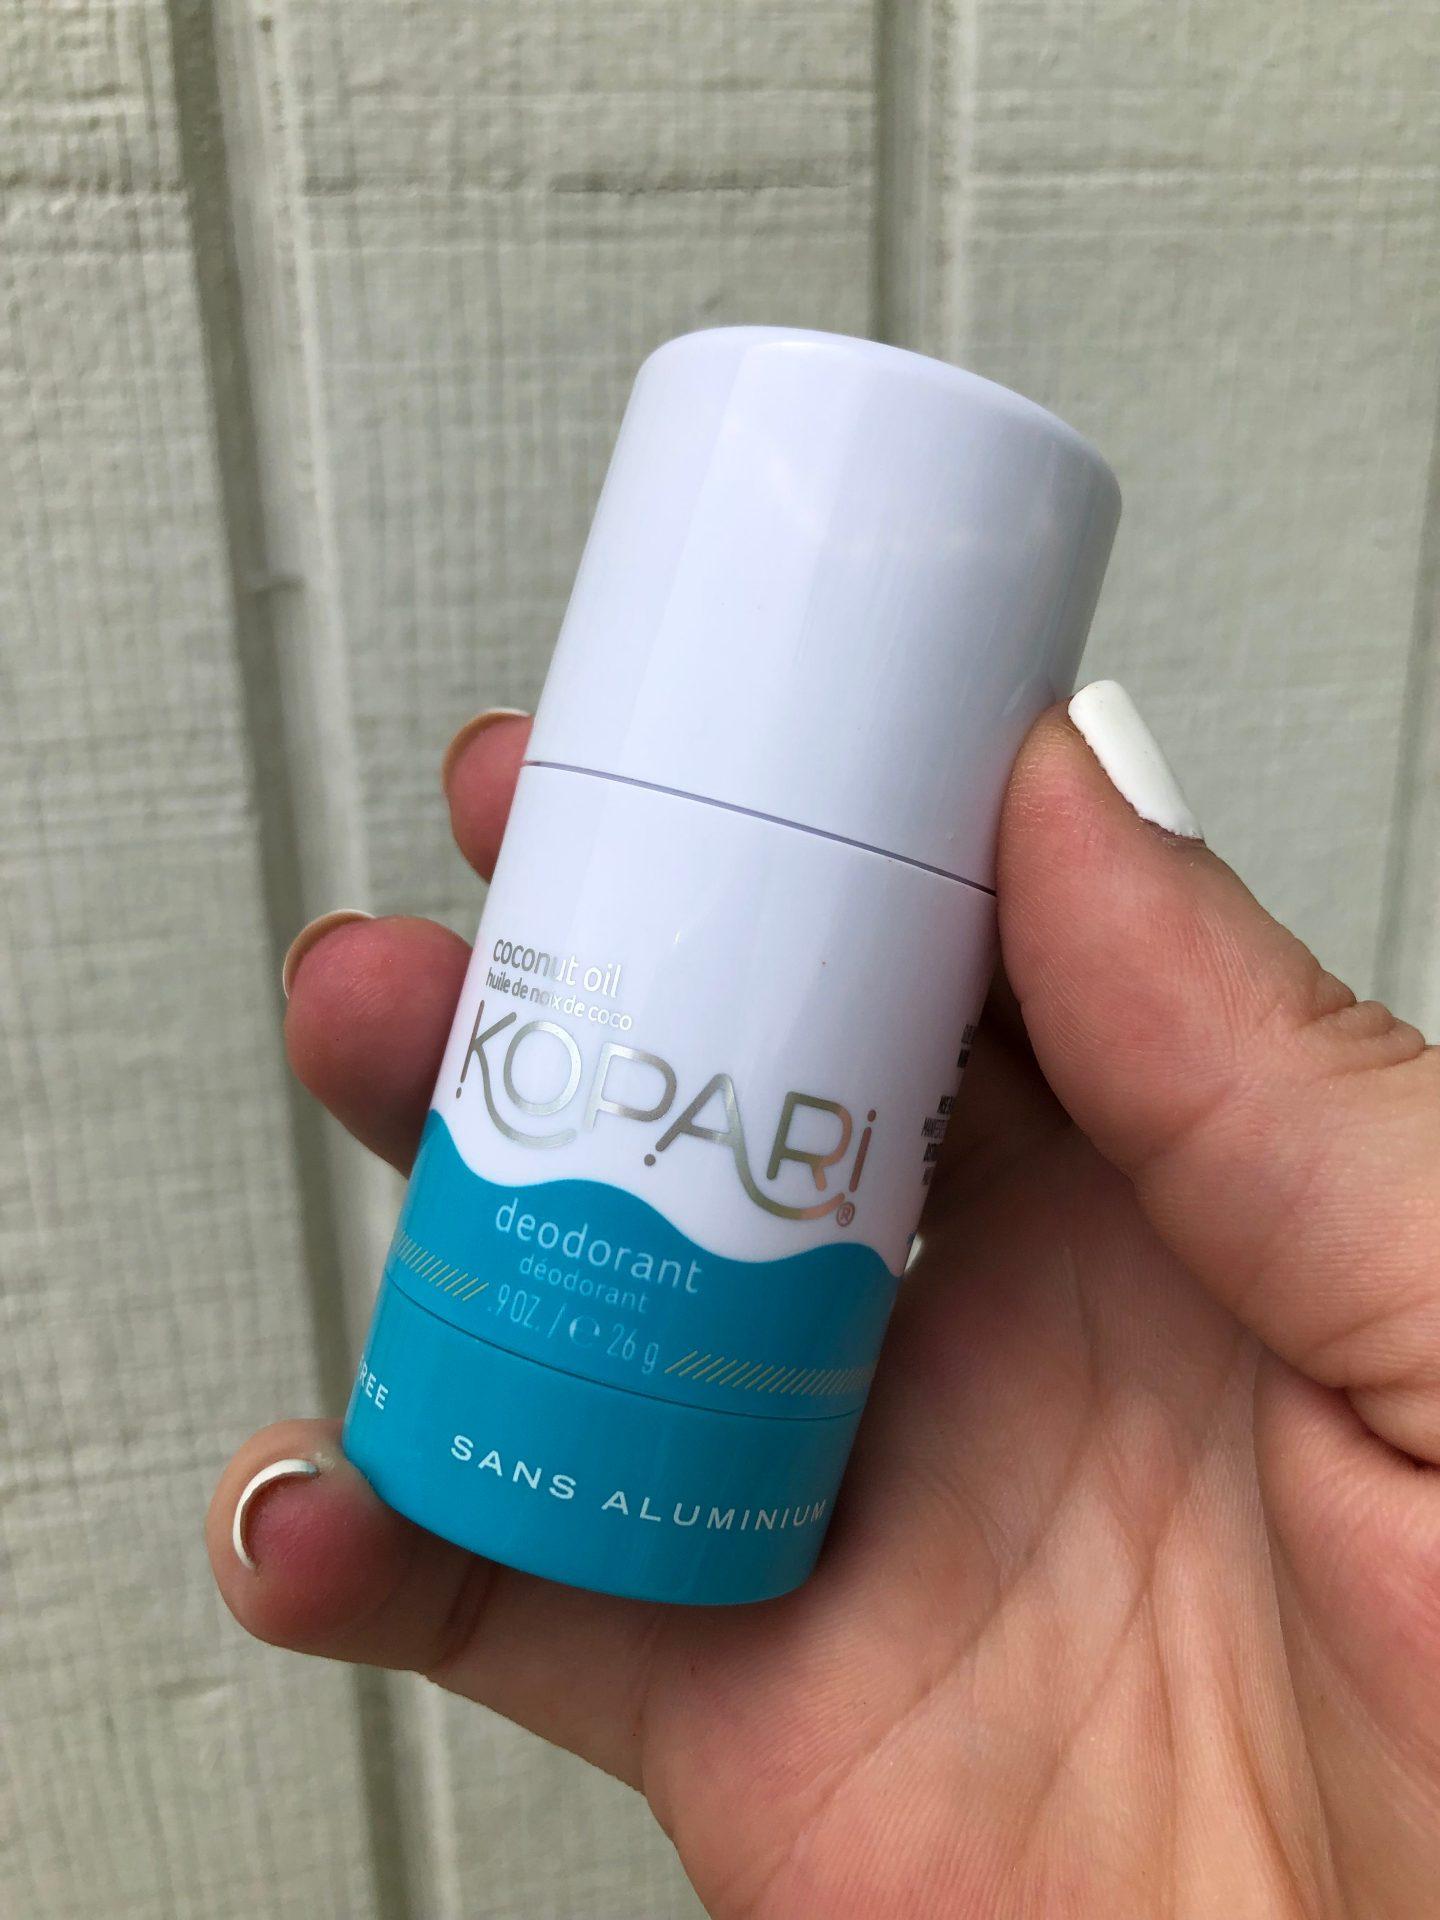 kopari deodorant